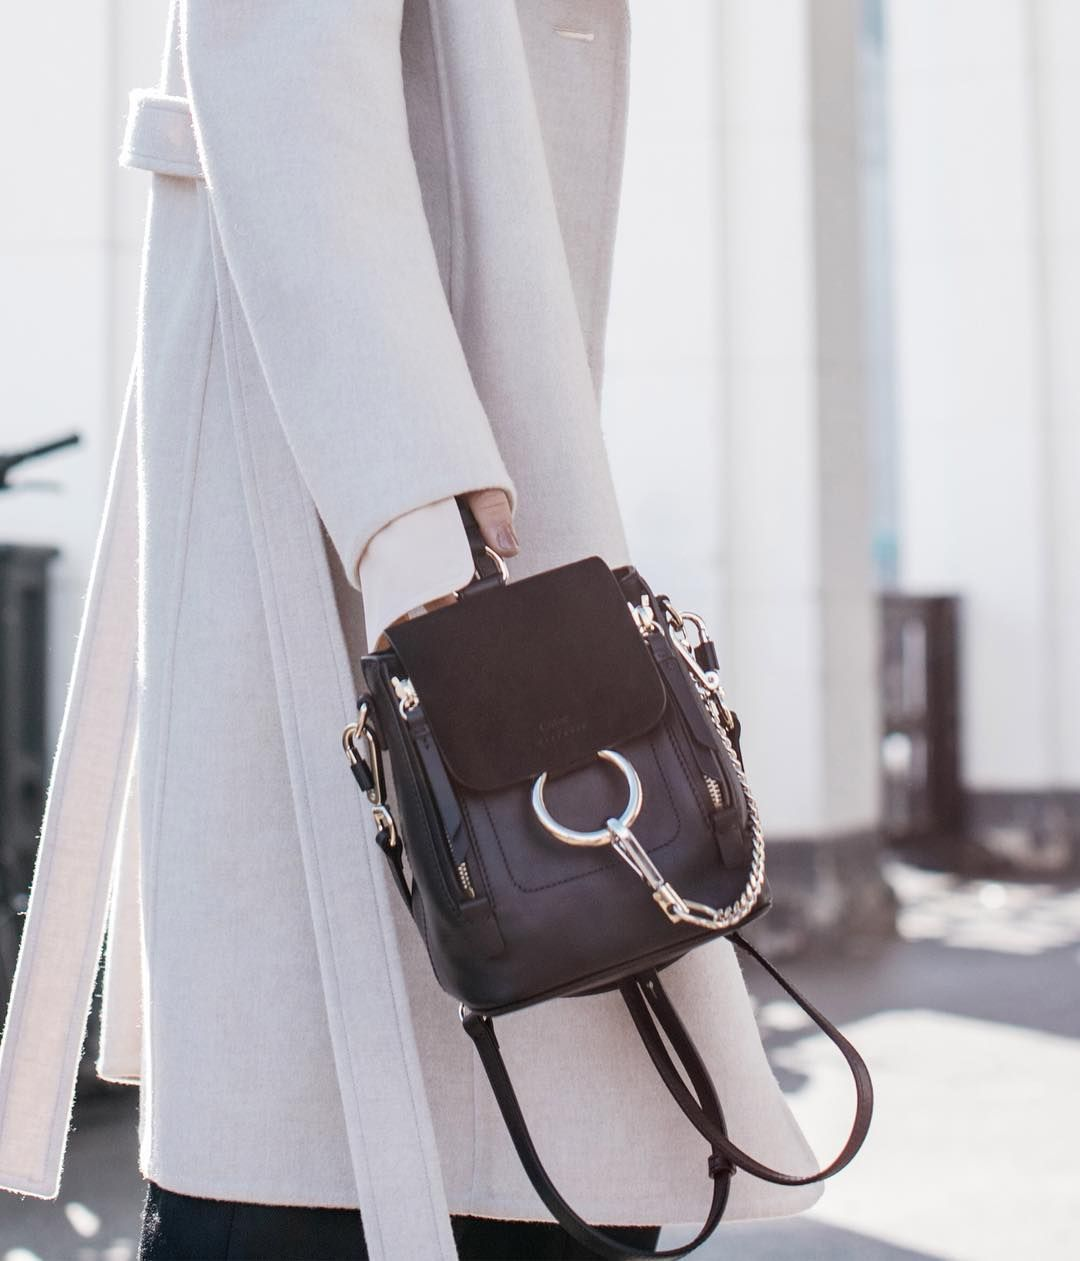 8e3d9a39b023 Chloé   Chloe   Faye   Backpack   Shoulder   Black   Leather   Suede ...